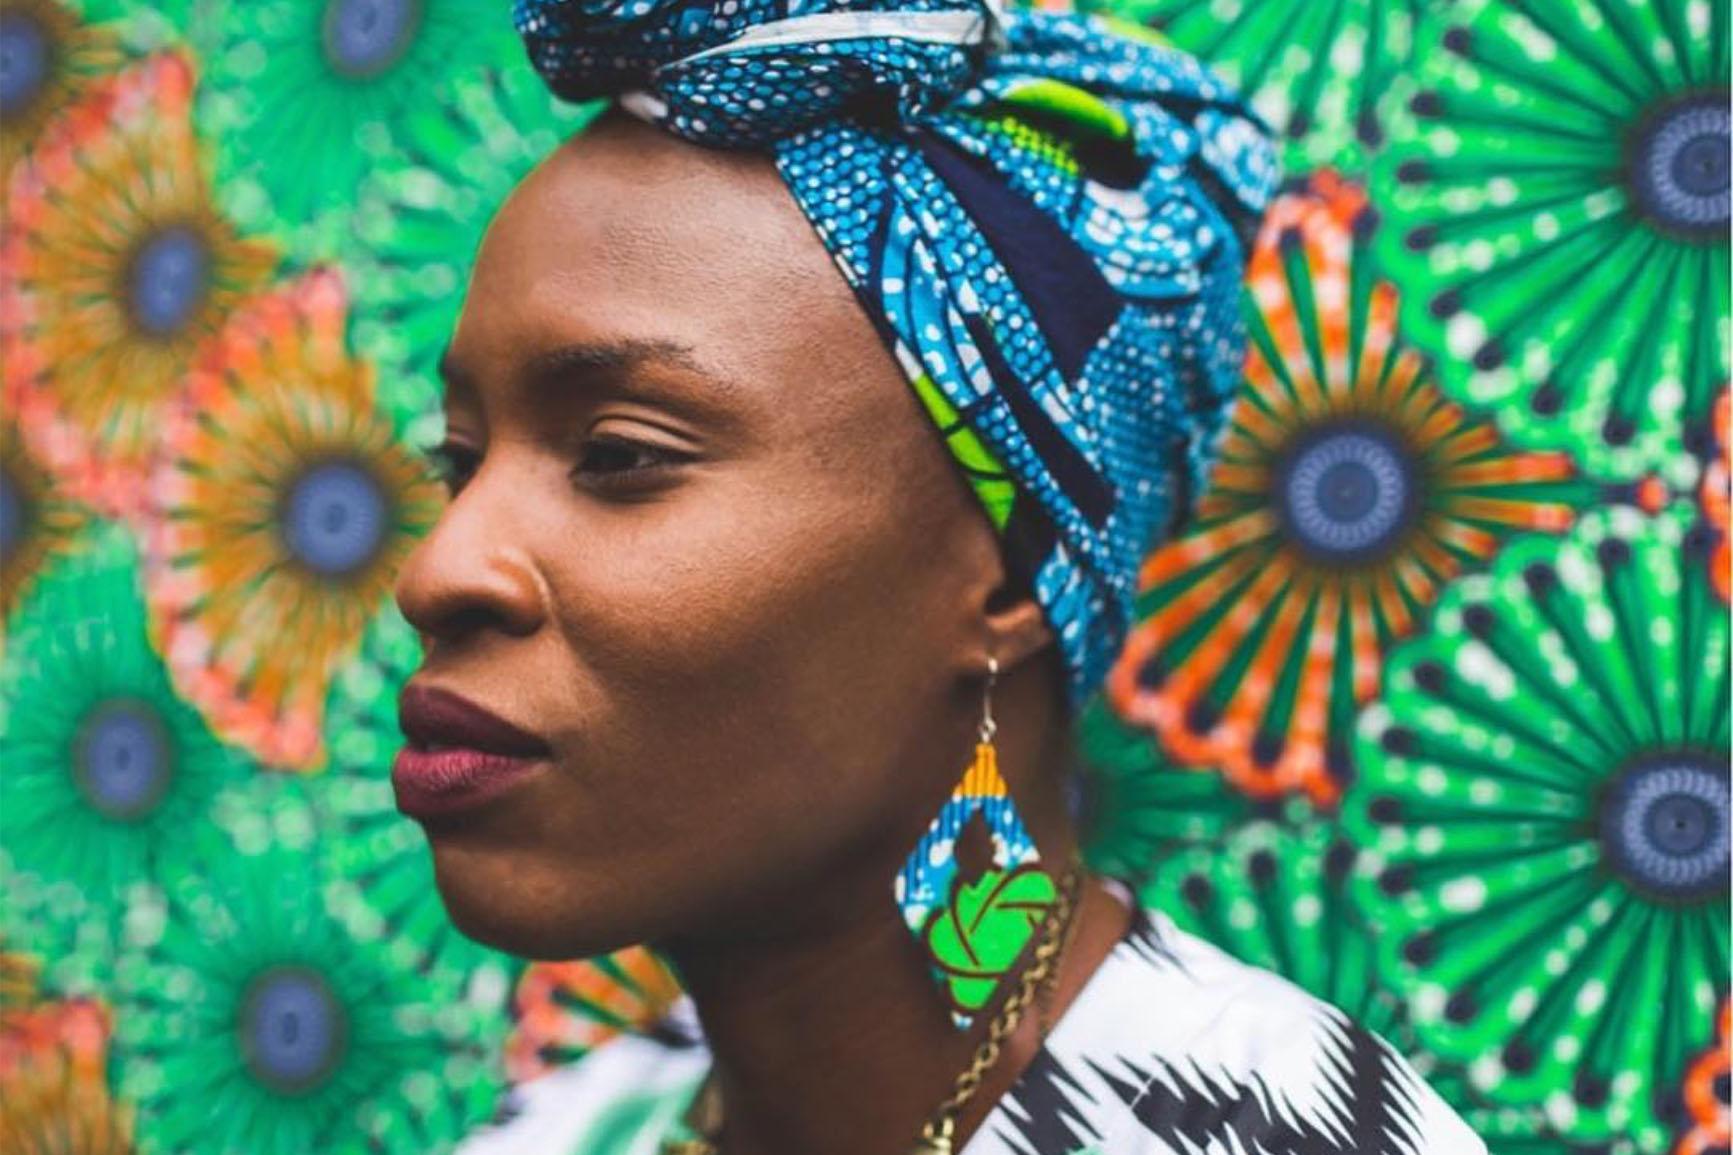 Marilyn Okoro by Dami Khadijah